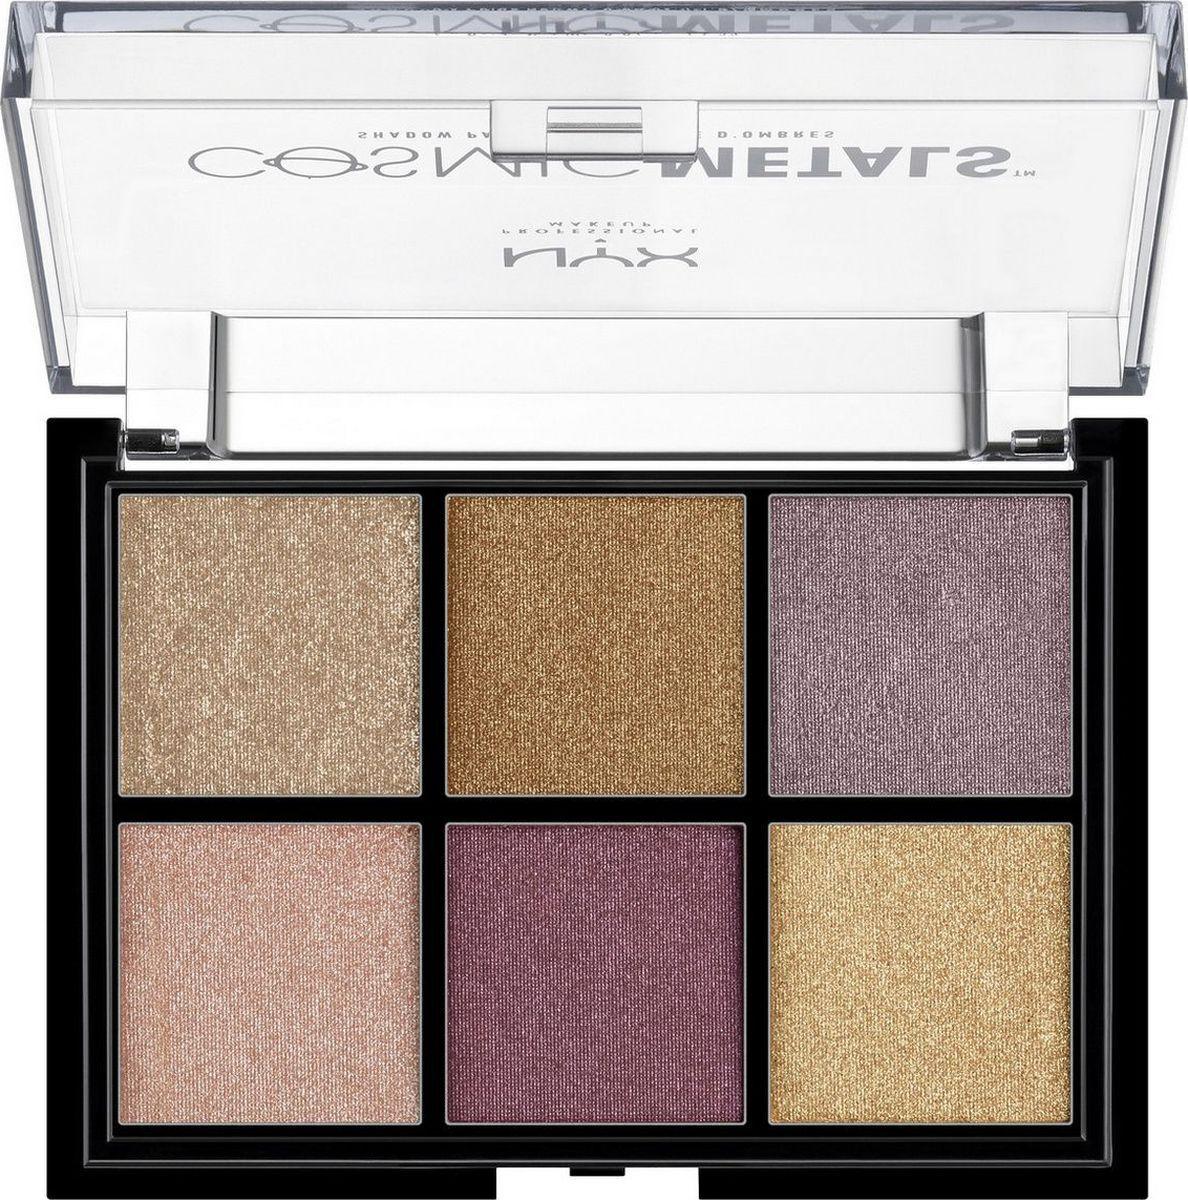 NYX Professional Makeup Сosmic metals shadow palette Палетка теней, оттенок 01, 8 г  #1